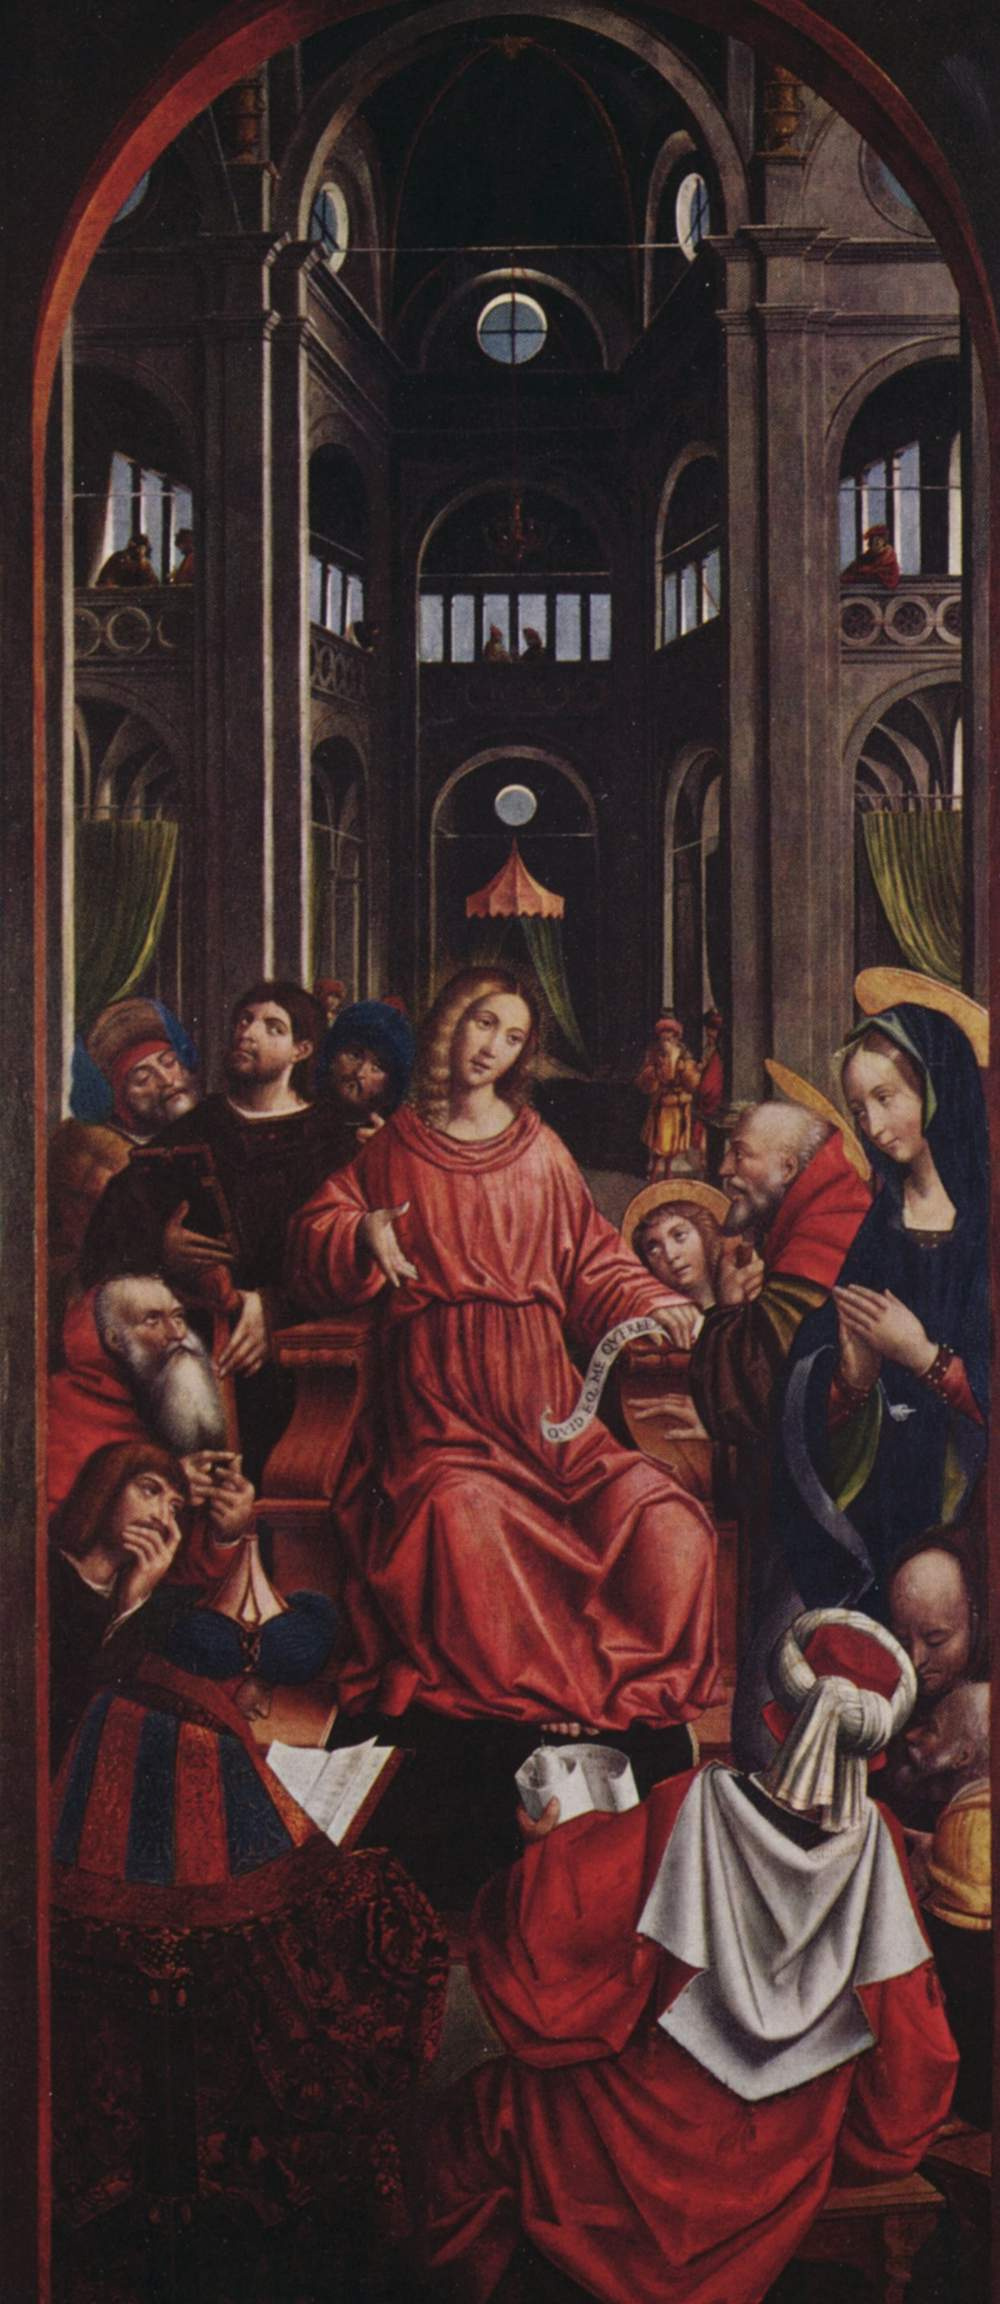 Defendent Ferrari. Twelve year old Christ in the temple